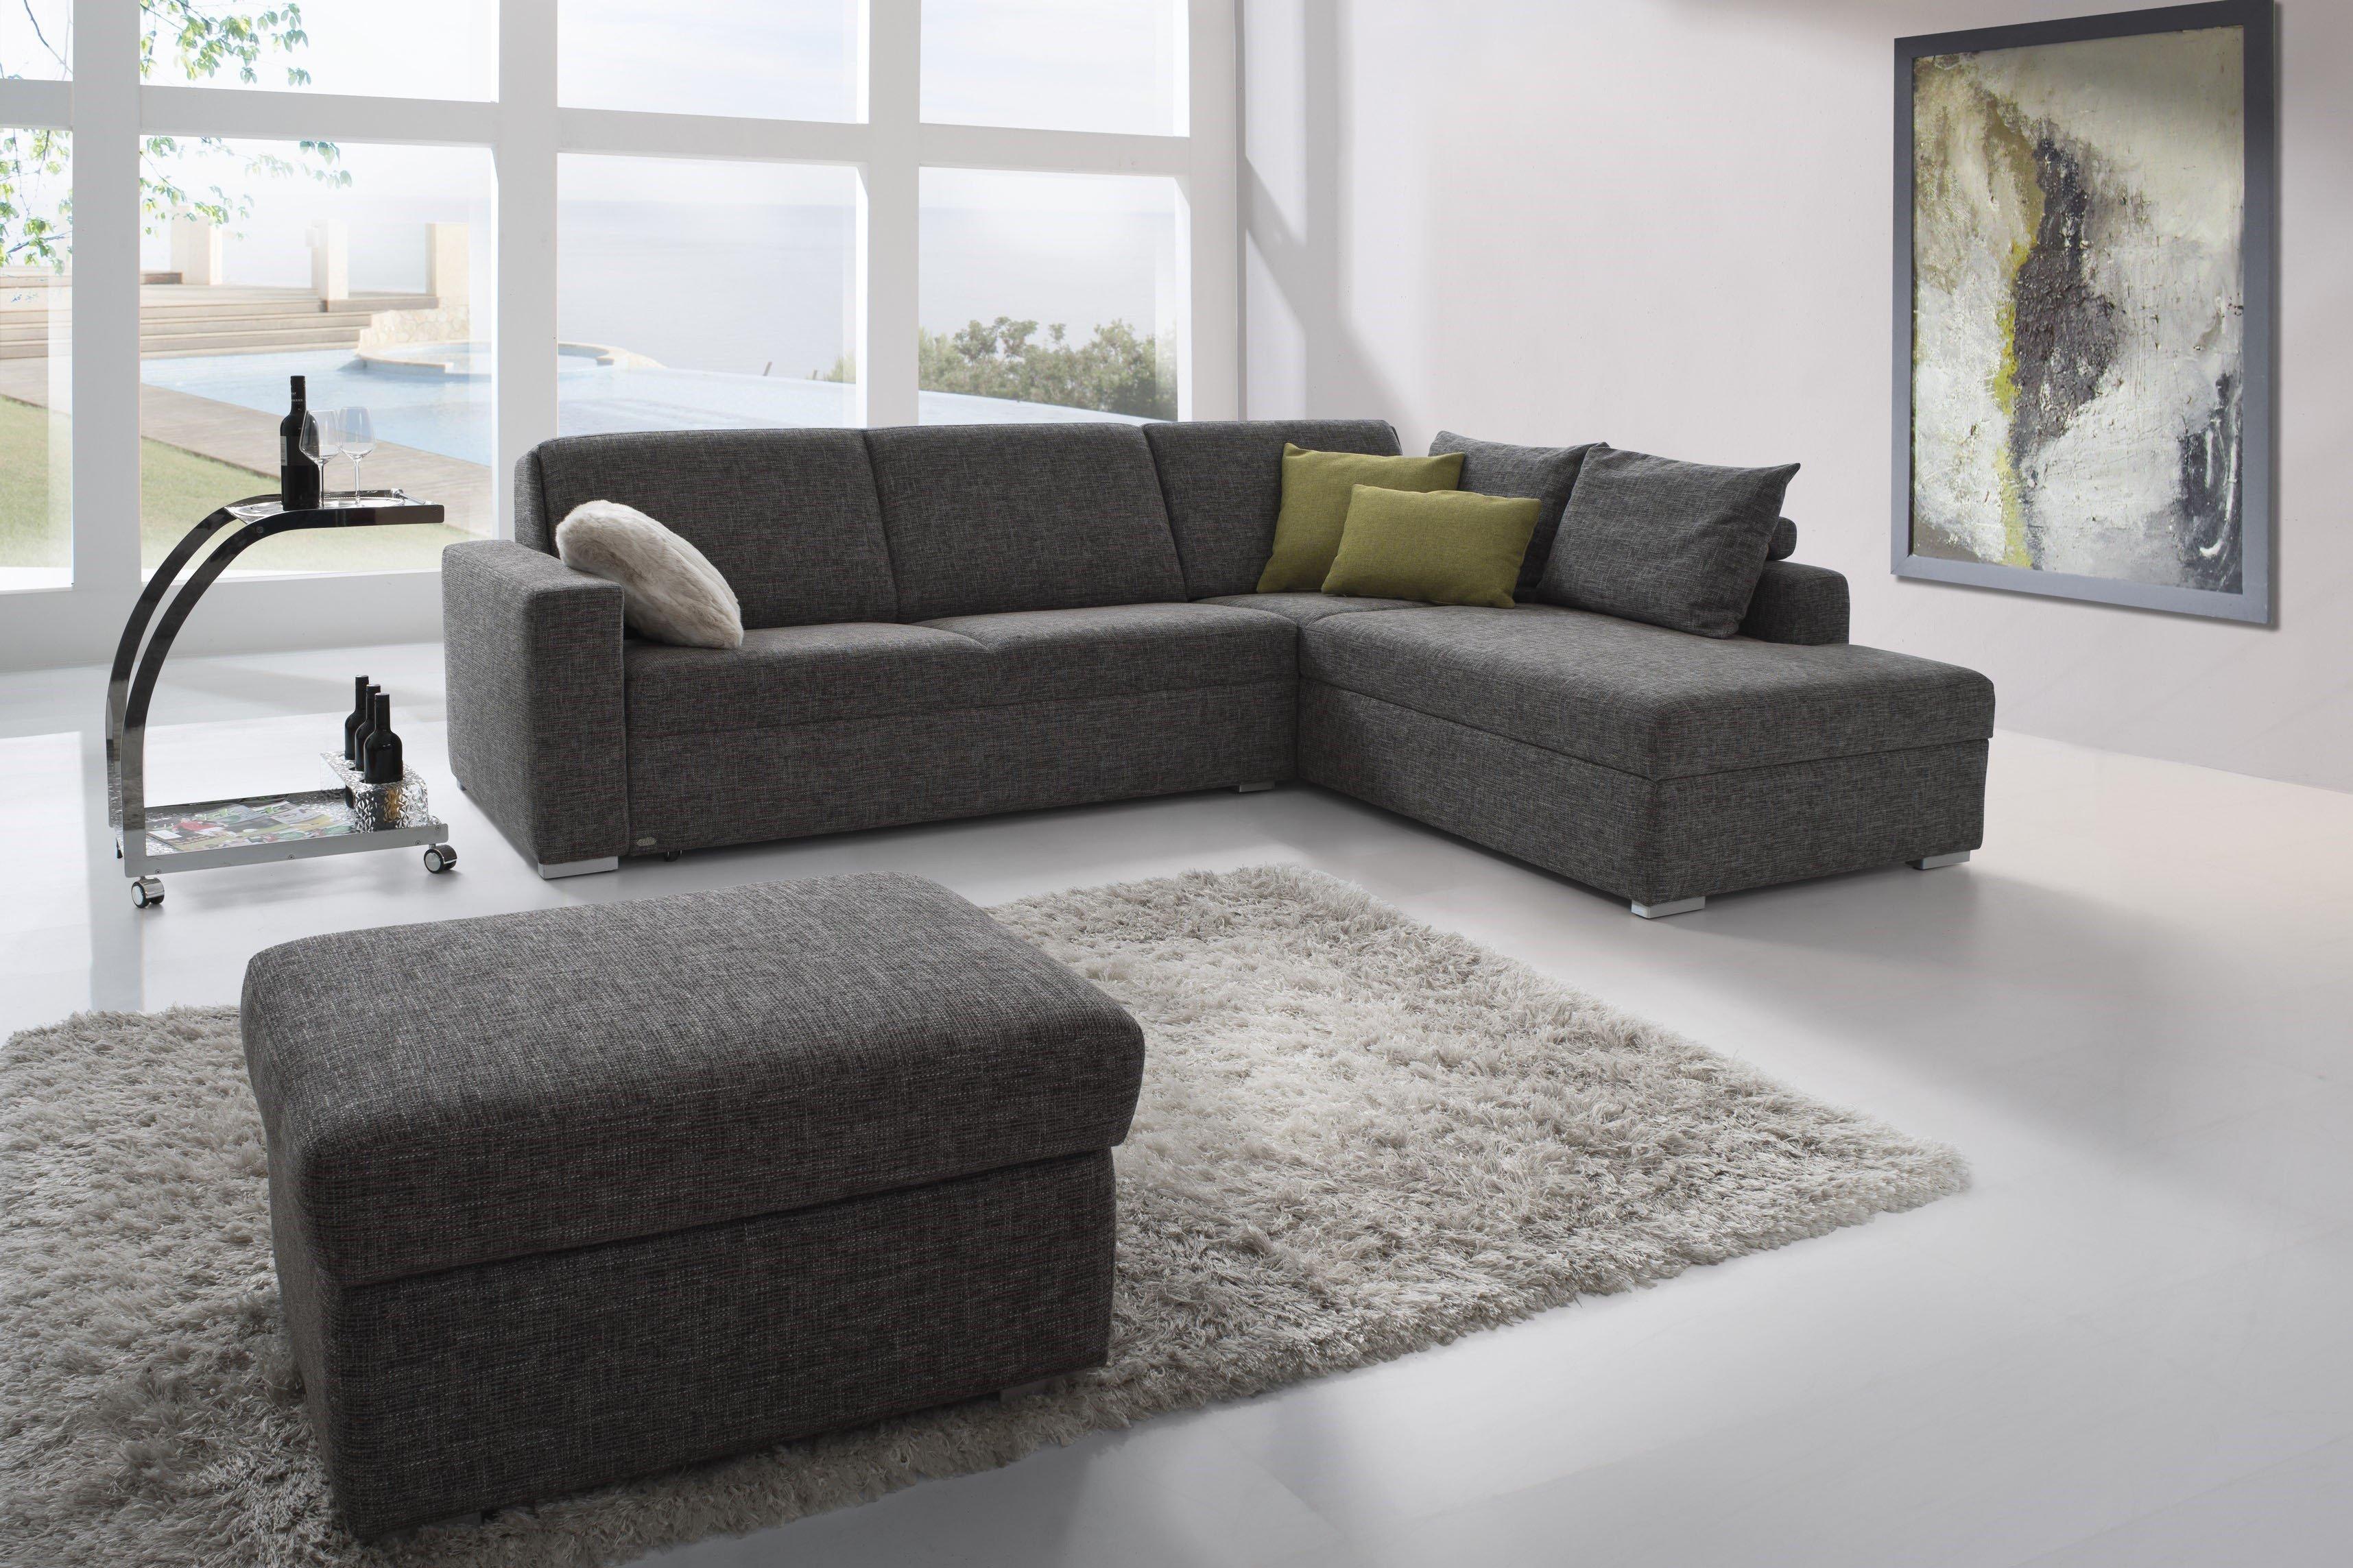 schlafsofa impuls von sedda schlafsofas g nstig online. Black Bedroom Furniture Sets. Home Design Ideas